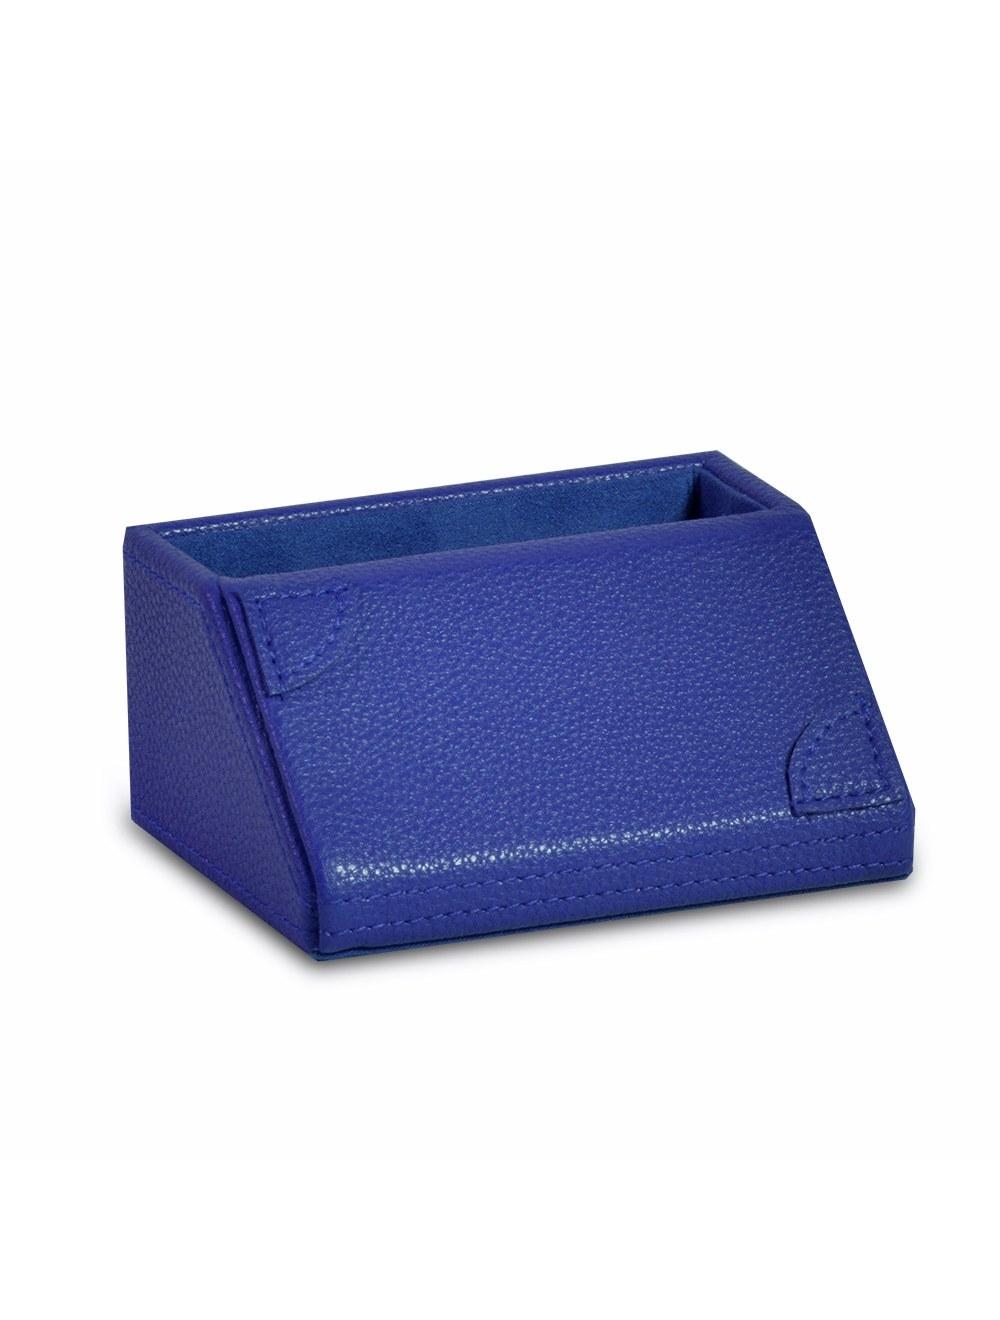 New Desk Business Card Holder - Ocean  Blue